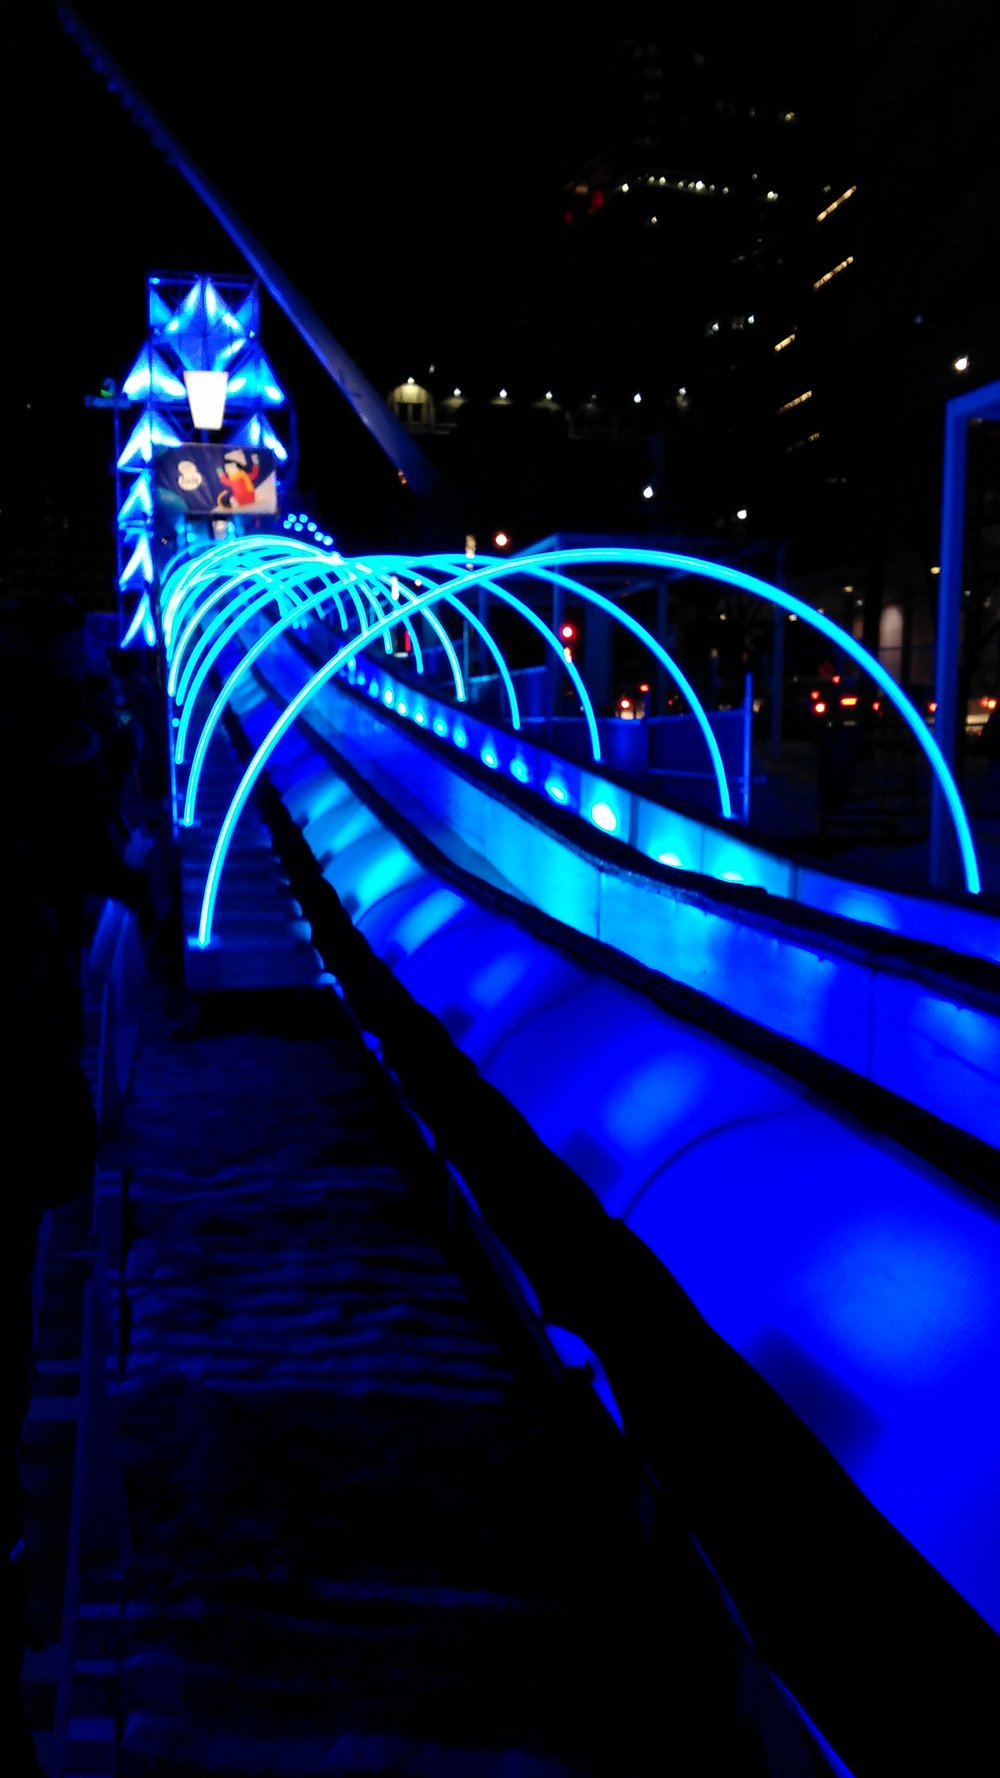 Illuminated toboggan un Montreal Nuit Blanche